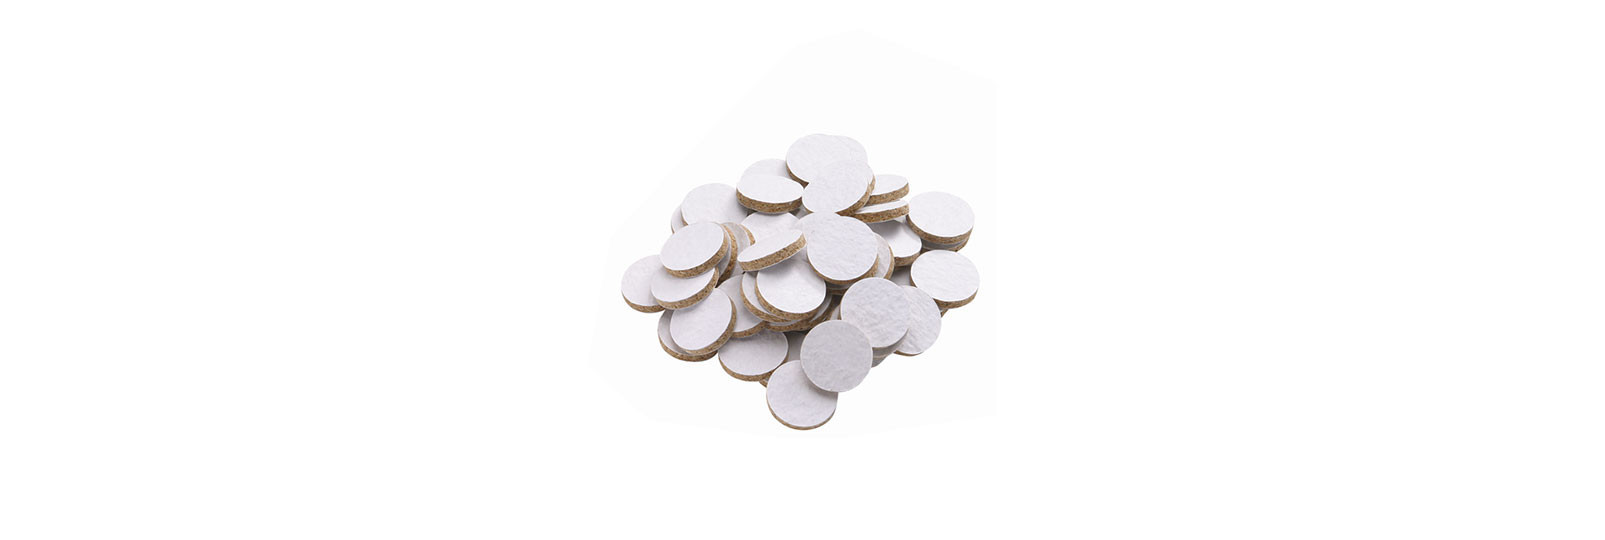 200 cork wads 20 ga. (3mm)